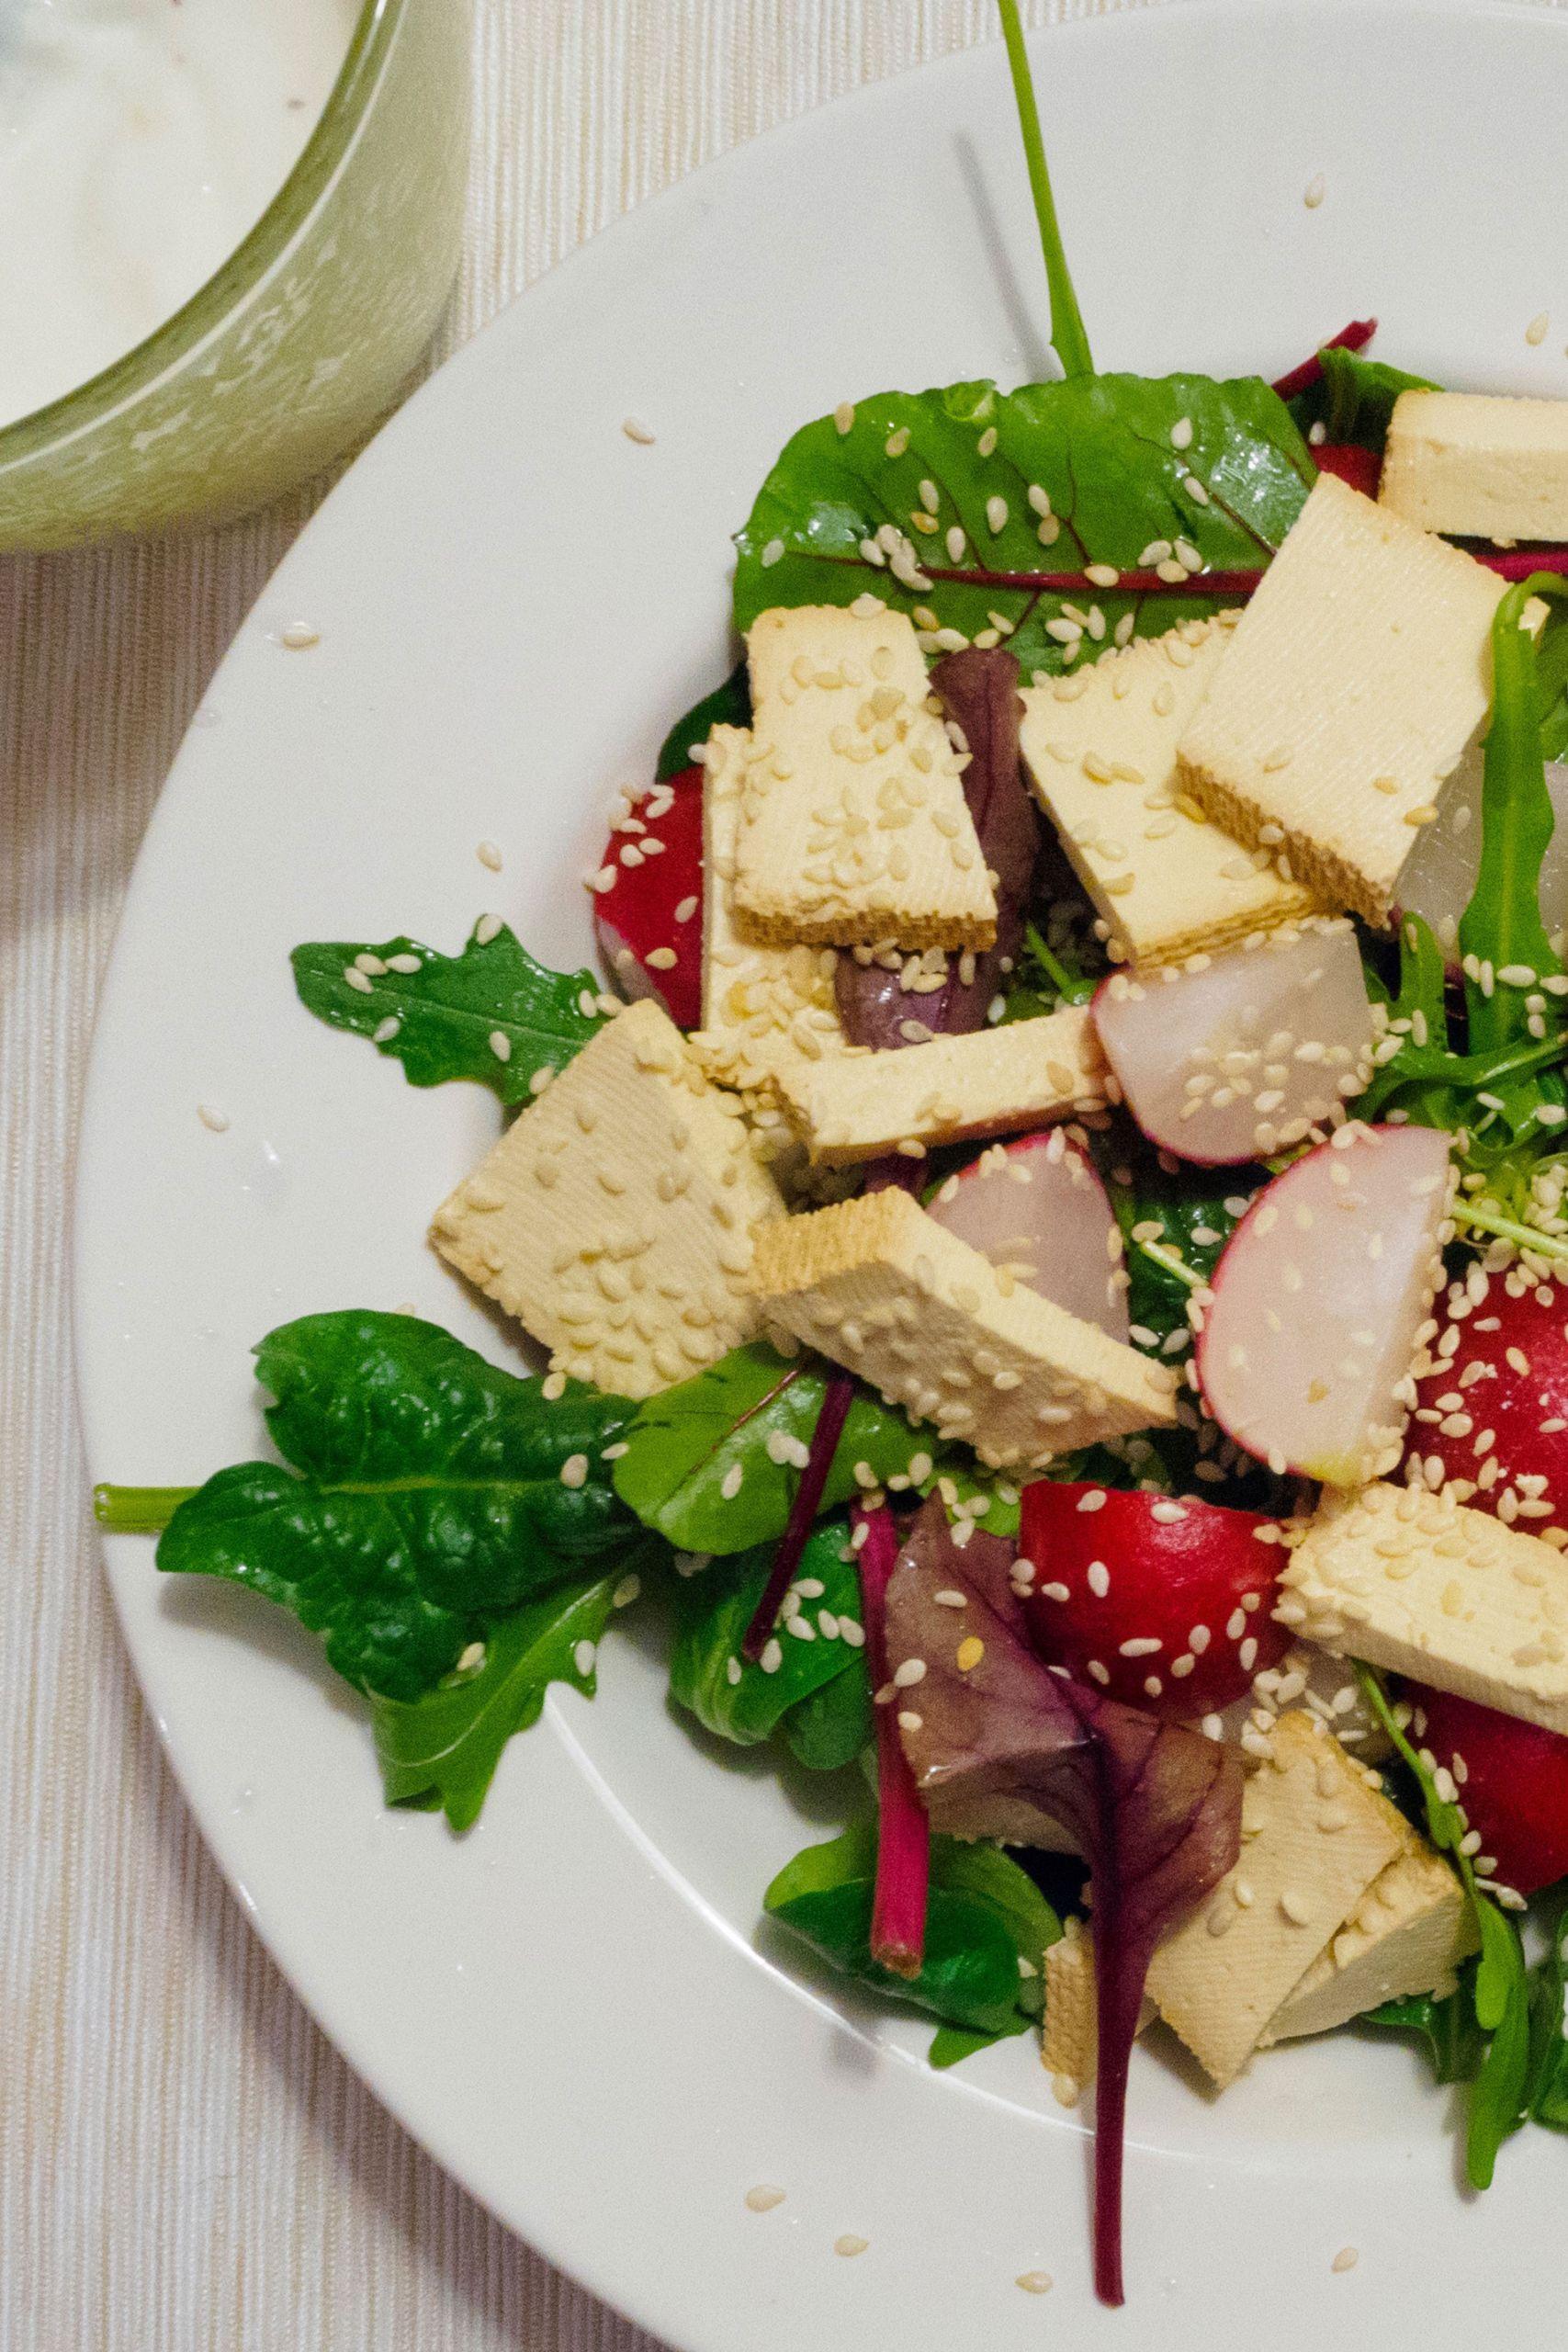 Easy Vegan Recipes For Beginners Simple  Simple Vegan Recipes For Beginners The 3 Ingre nt Meal